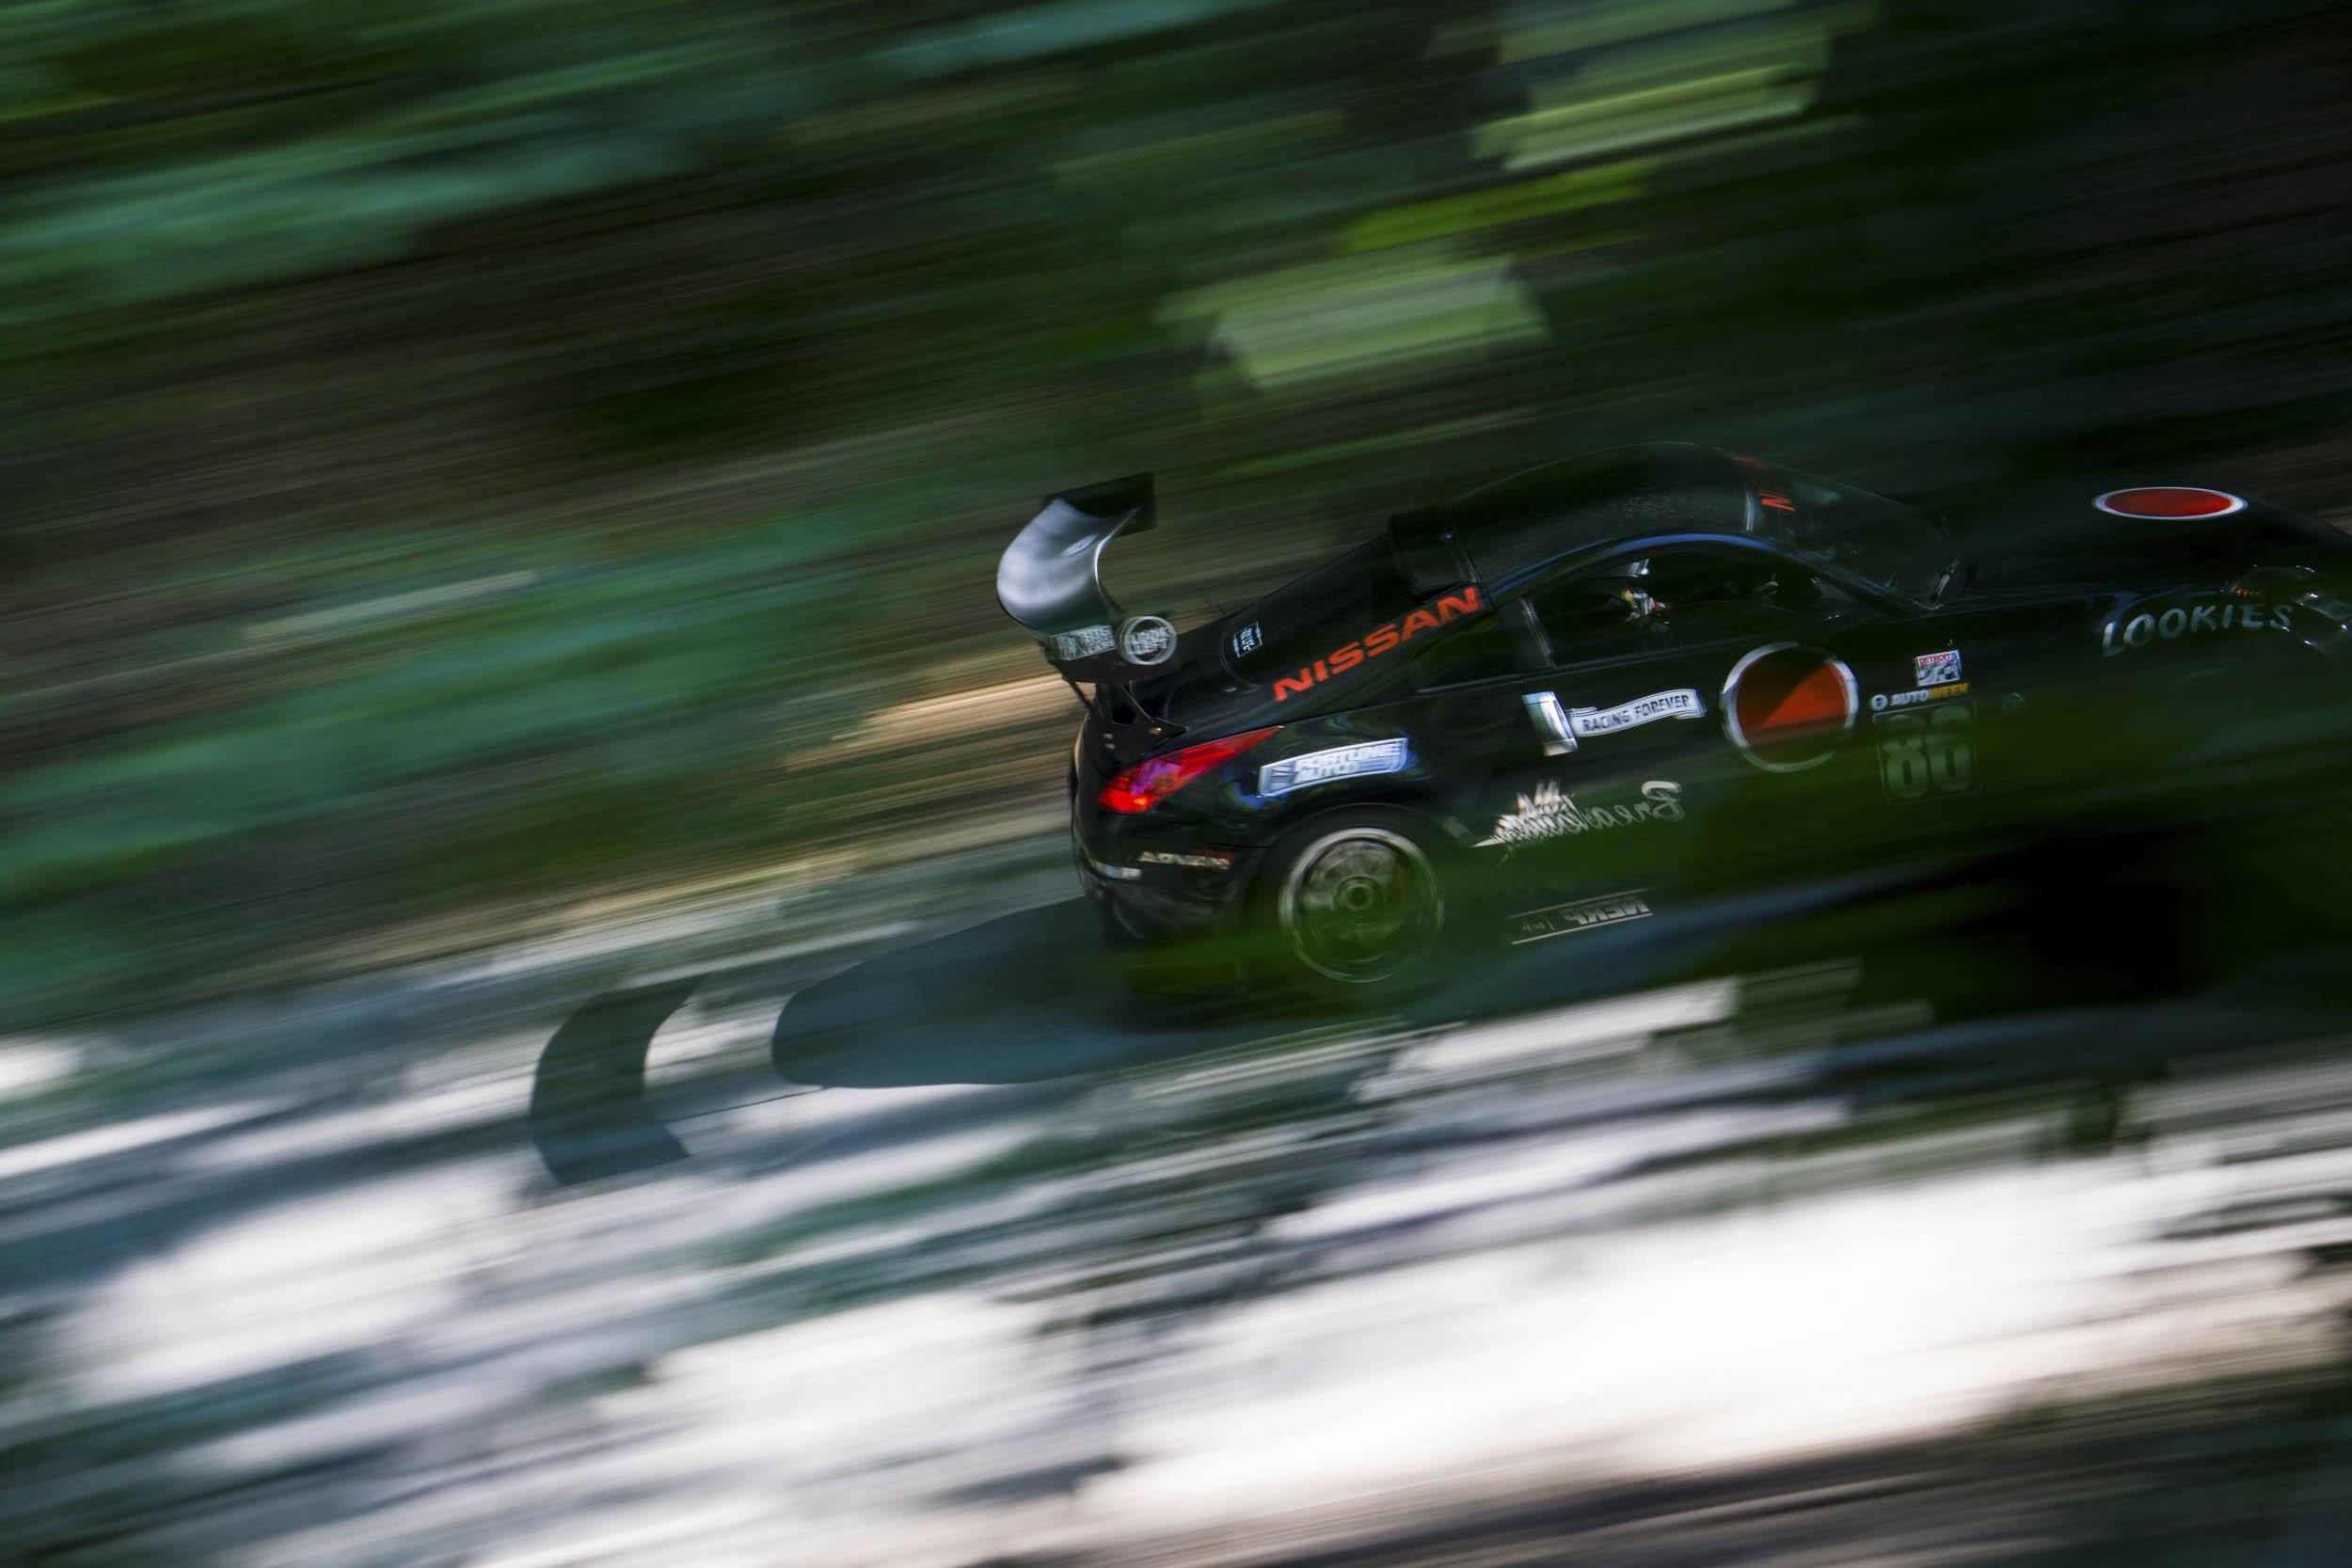 Nissan 350Z blur